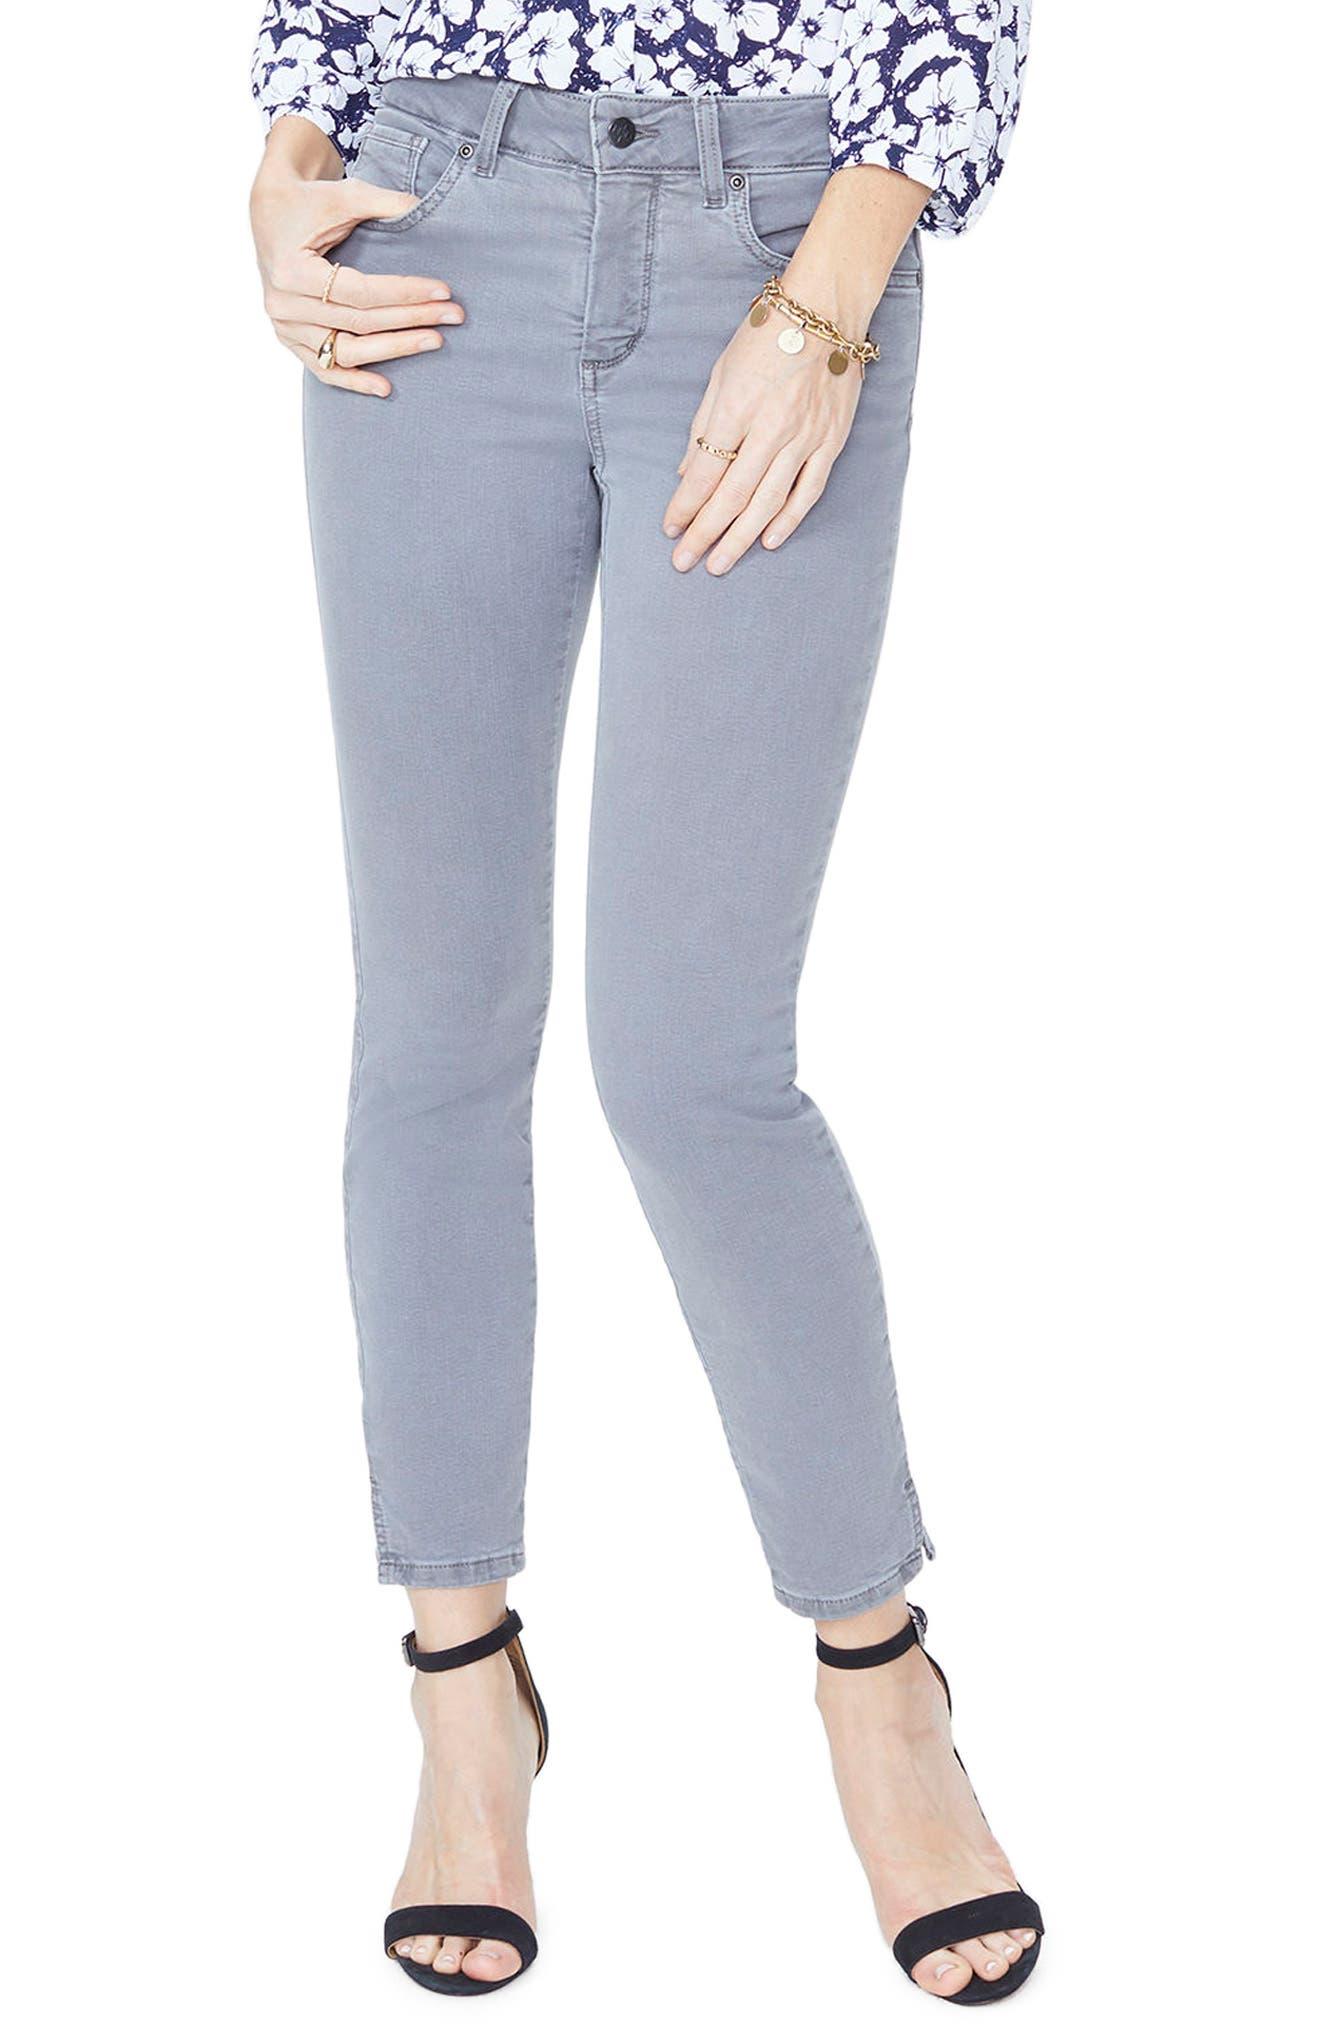 Main Image - NYDJ Ami Stretch Ankle Skinny Jeans (Regular & Petite)